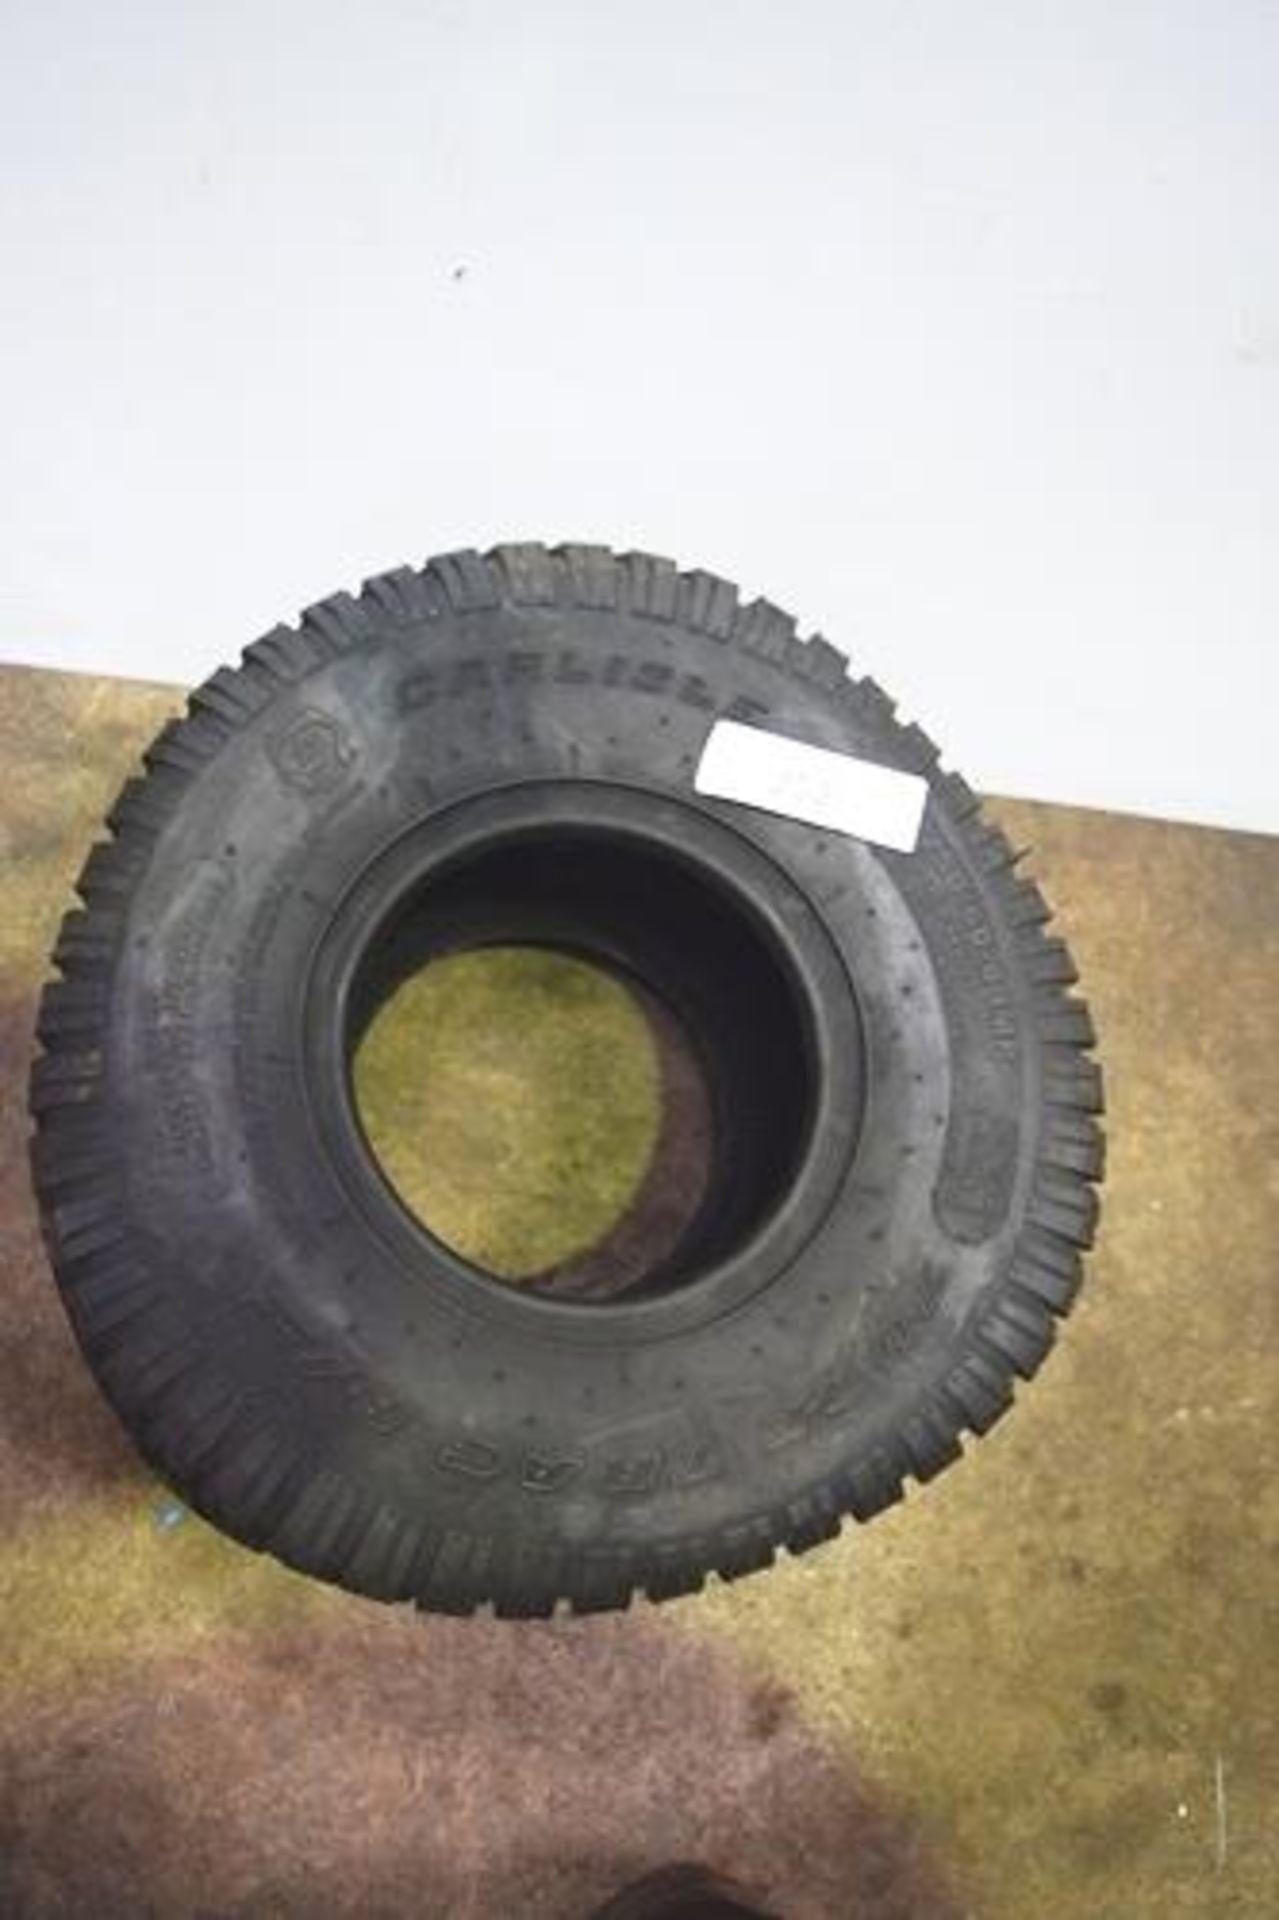 1 x Carlisle Turf Trac R/S 250/60.8 IMP tyre - New (GS10)